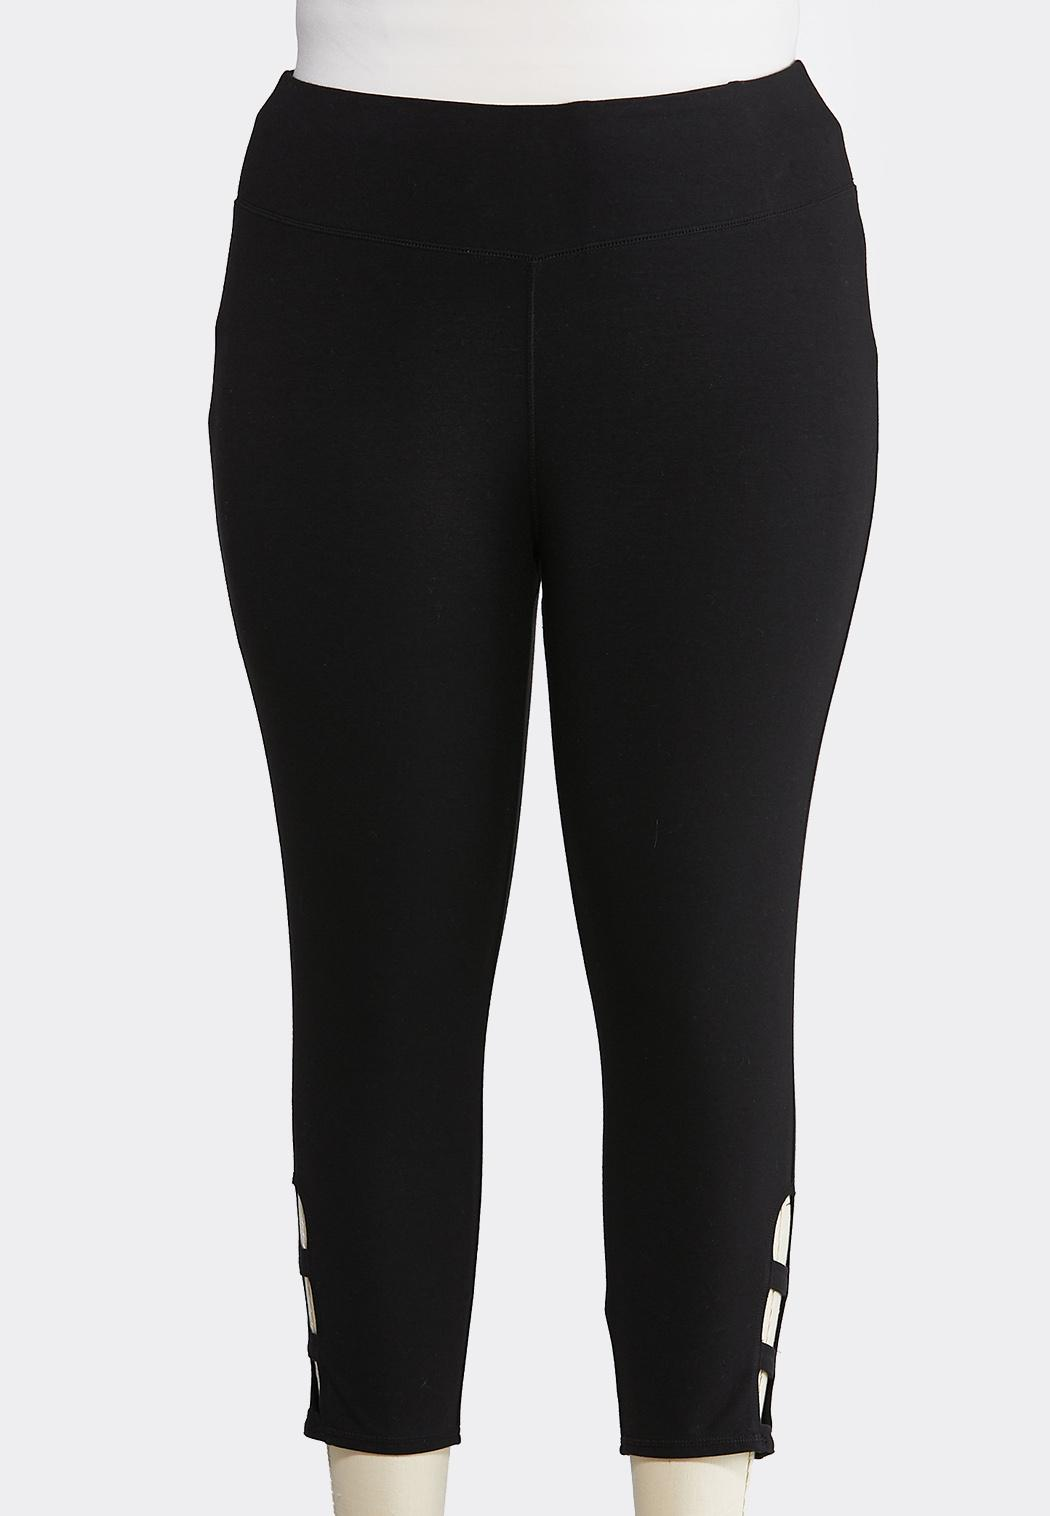 dea0dce10ee928 Plus Size Cutout Lattice Cropped Leggings Bottoms Cato Fashions